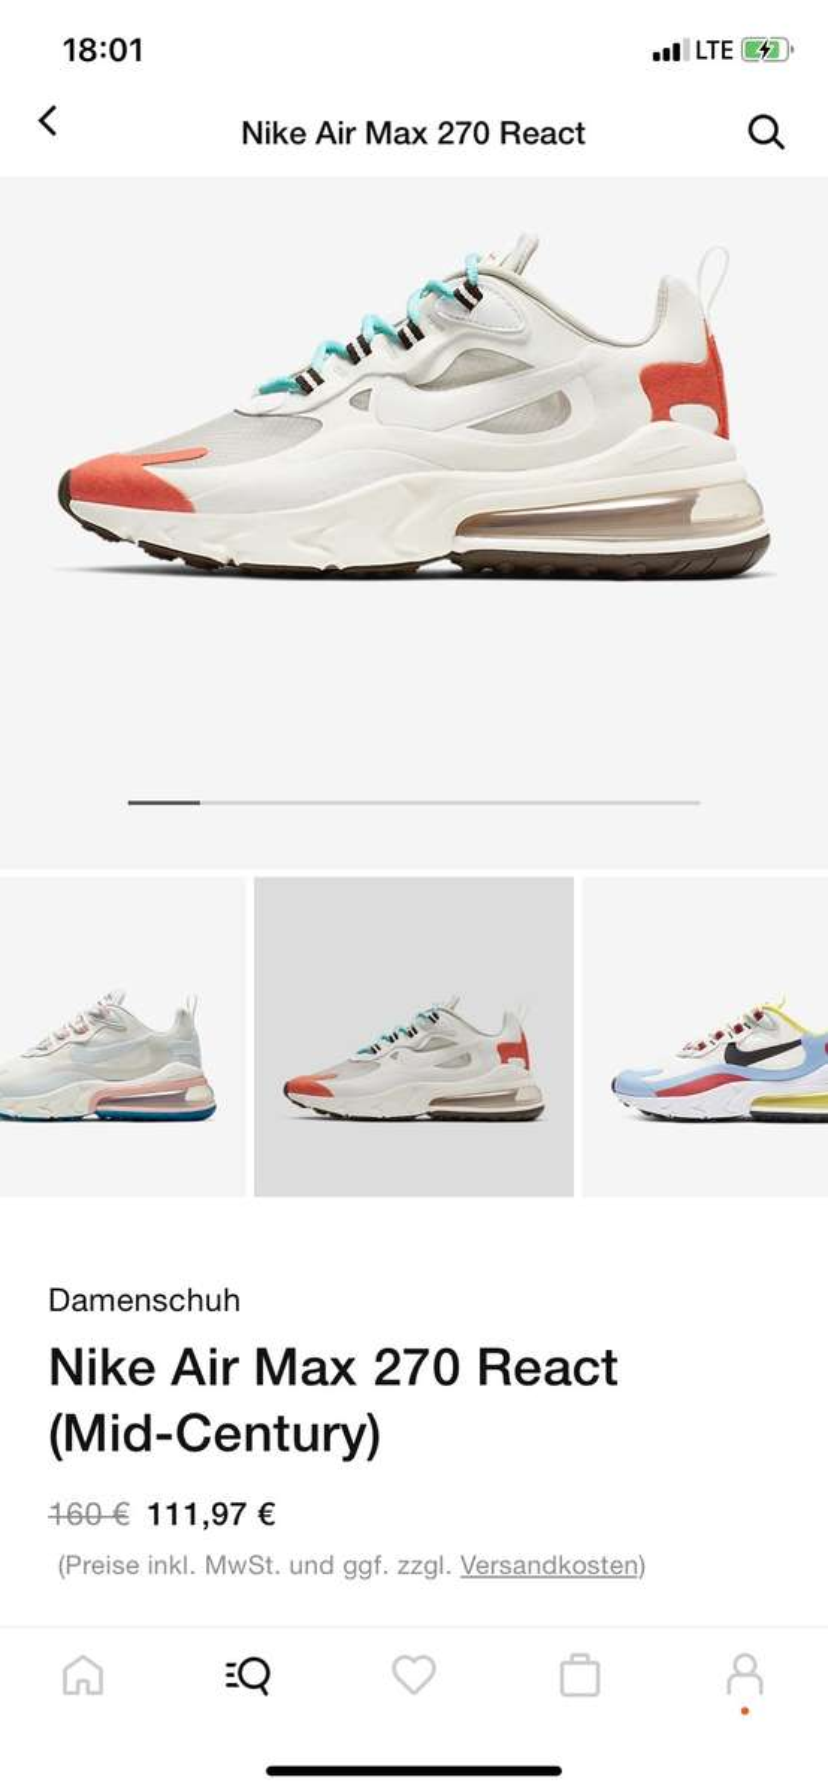 React 270 Nike Nike Air Max qVpSMzU